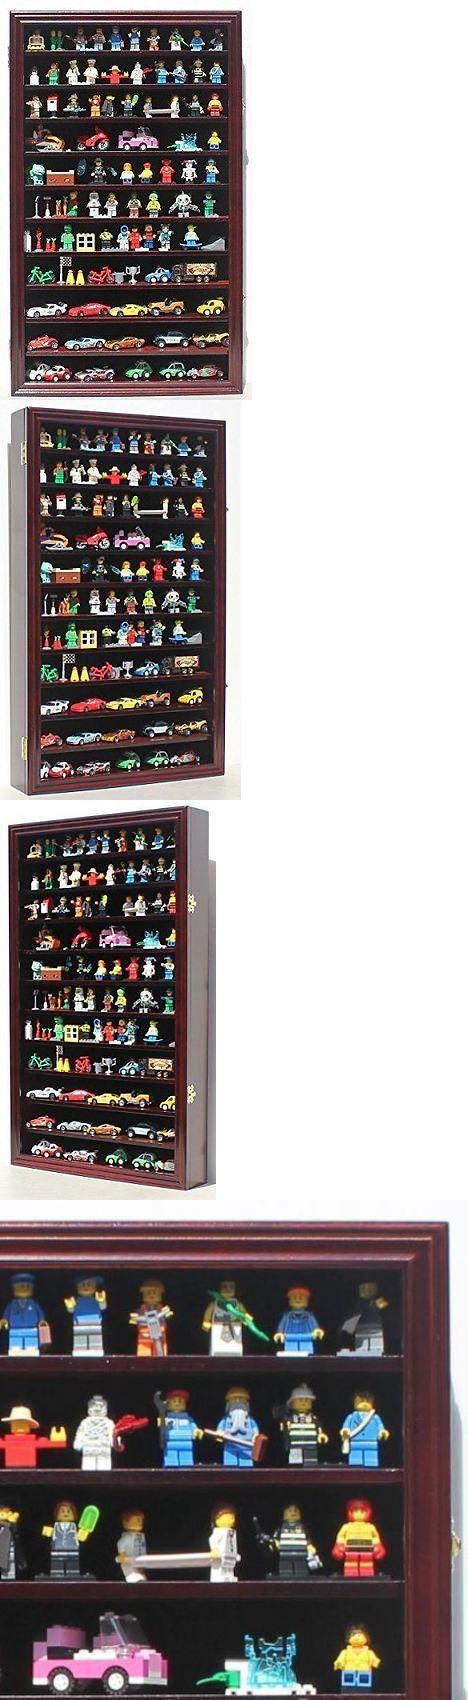 Double pistol handgun revolver gun display case cabinet rack shadowbox - Shadow Boxes 41512 Minifigures Miniature Action Figures Display Case Wall Curio Cabinet Hw11